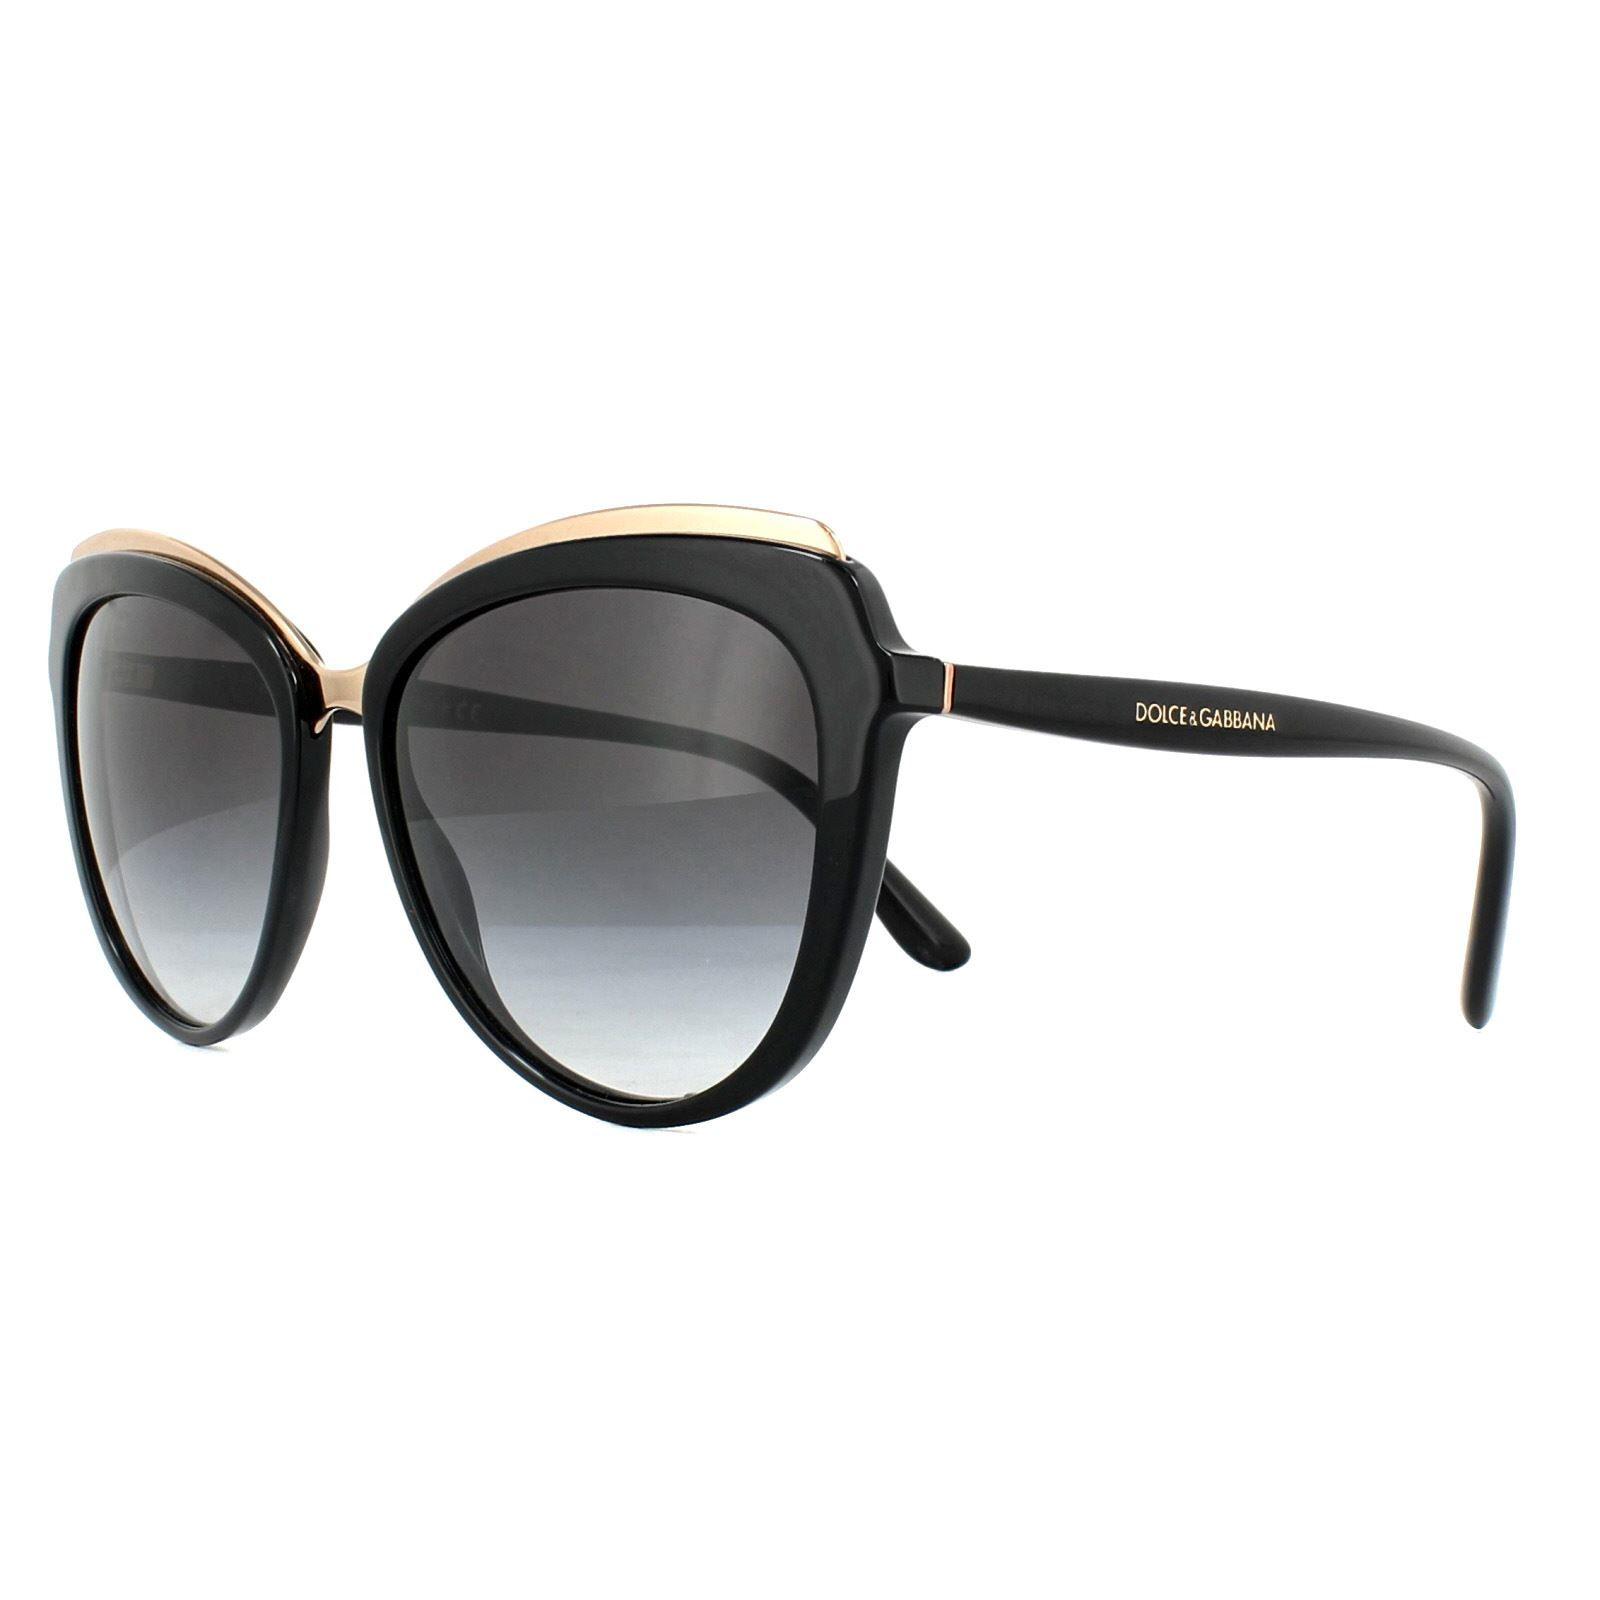 Dolce & Gabbana Sunglasses DG4304 501/8G Black Grey Gradient